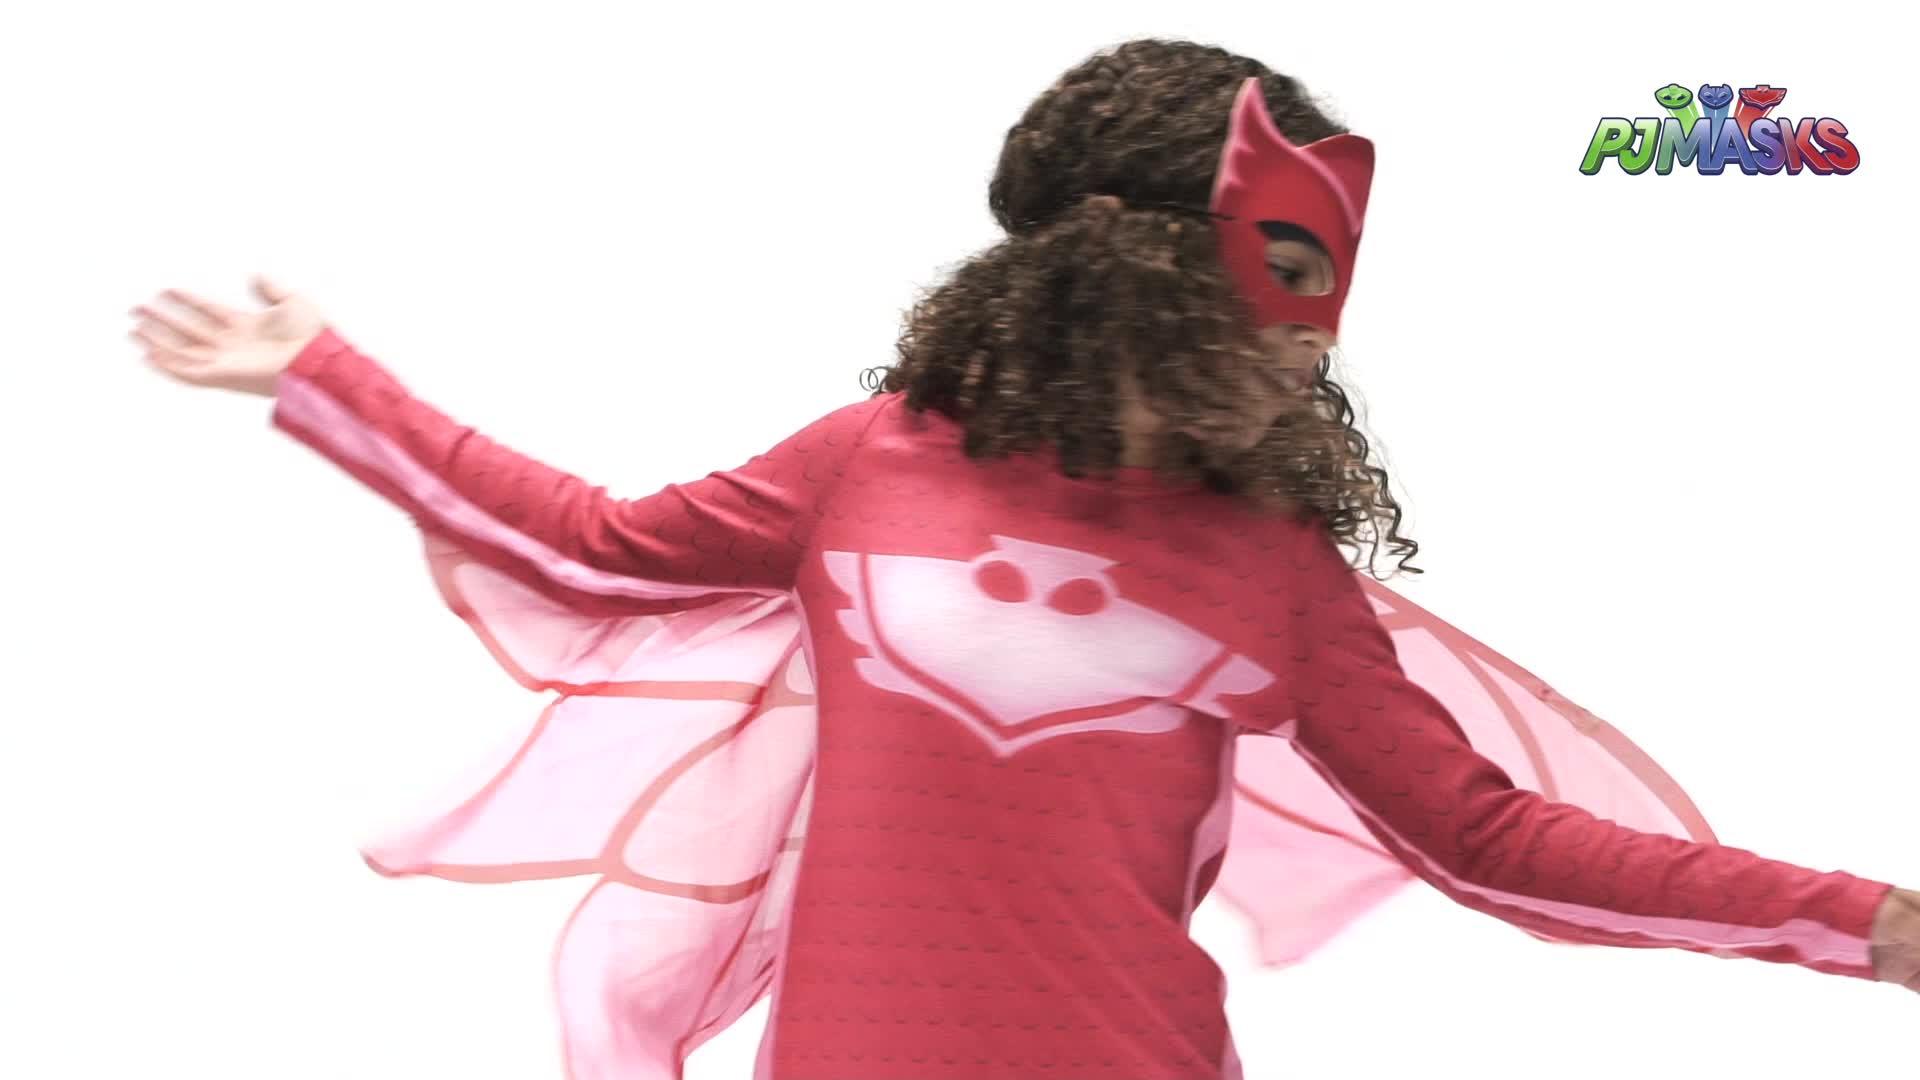 Viving Costumes-231297 Disfraz PJ Masks Owlette Camiseta, Multicolor (231297)